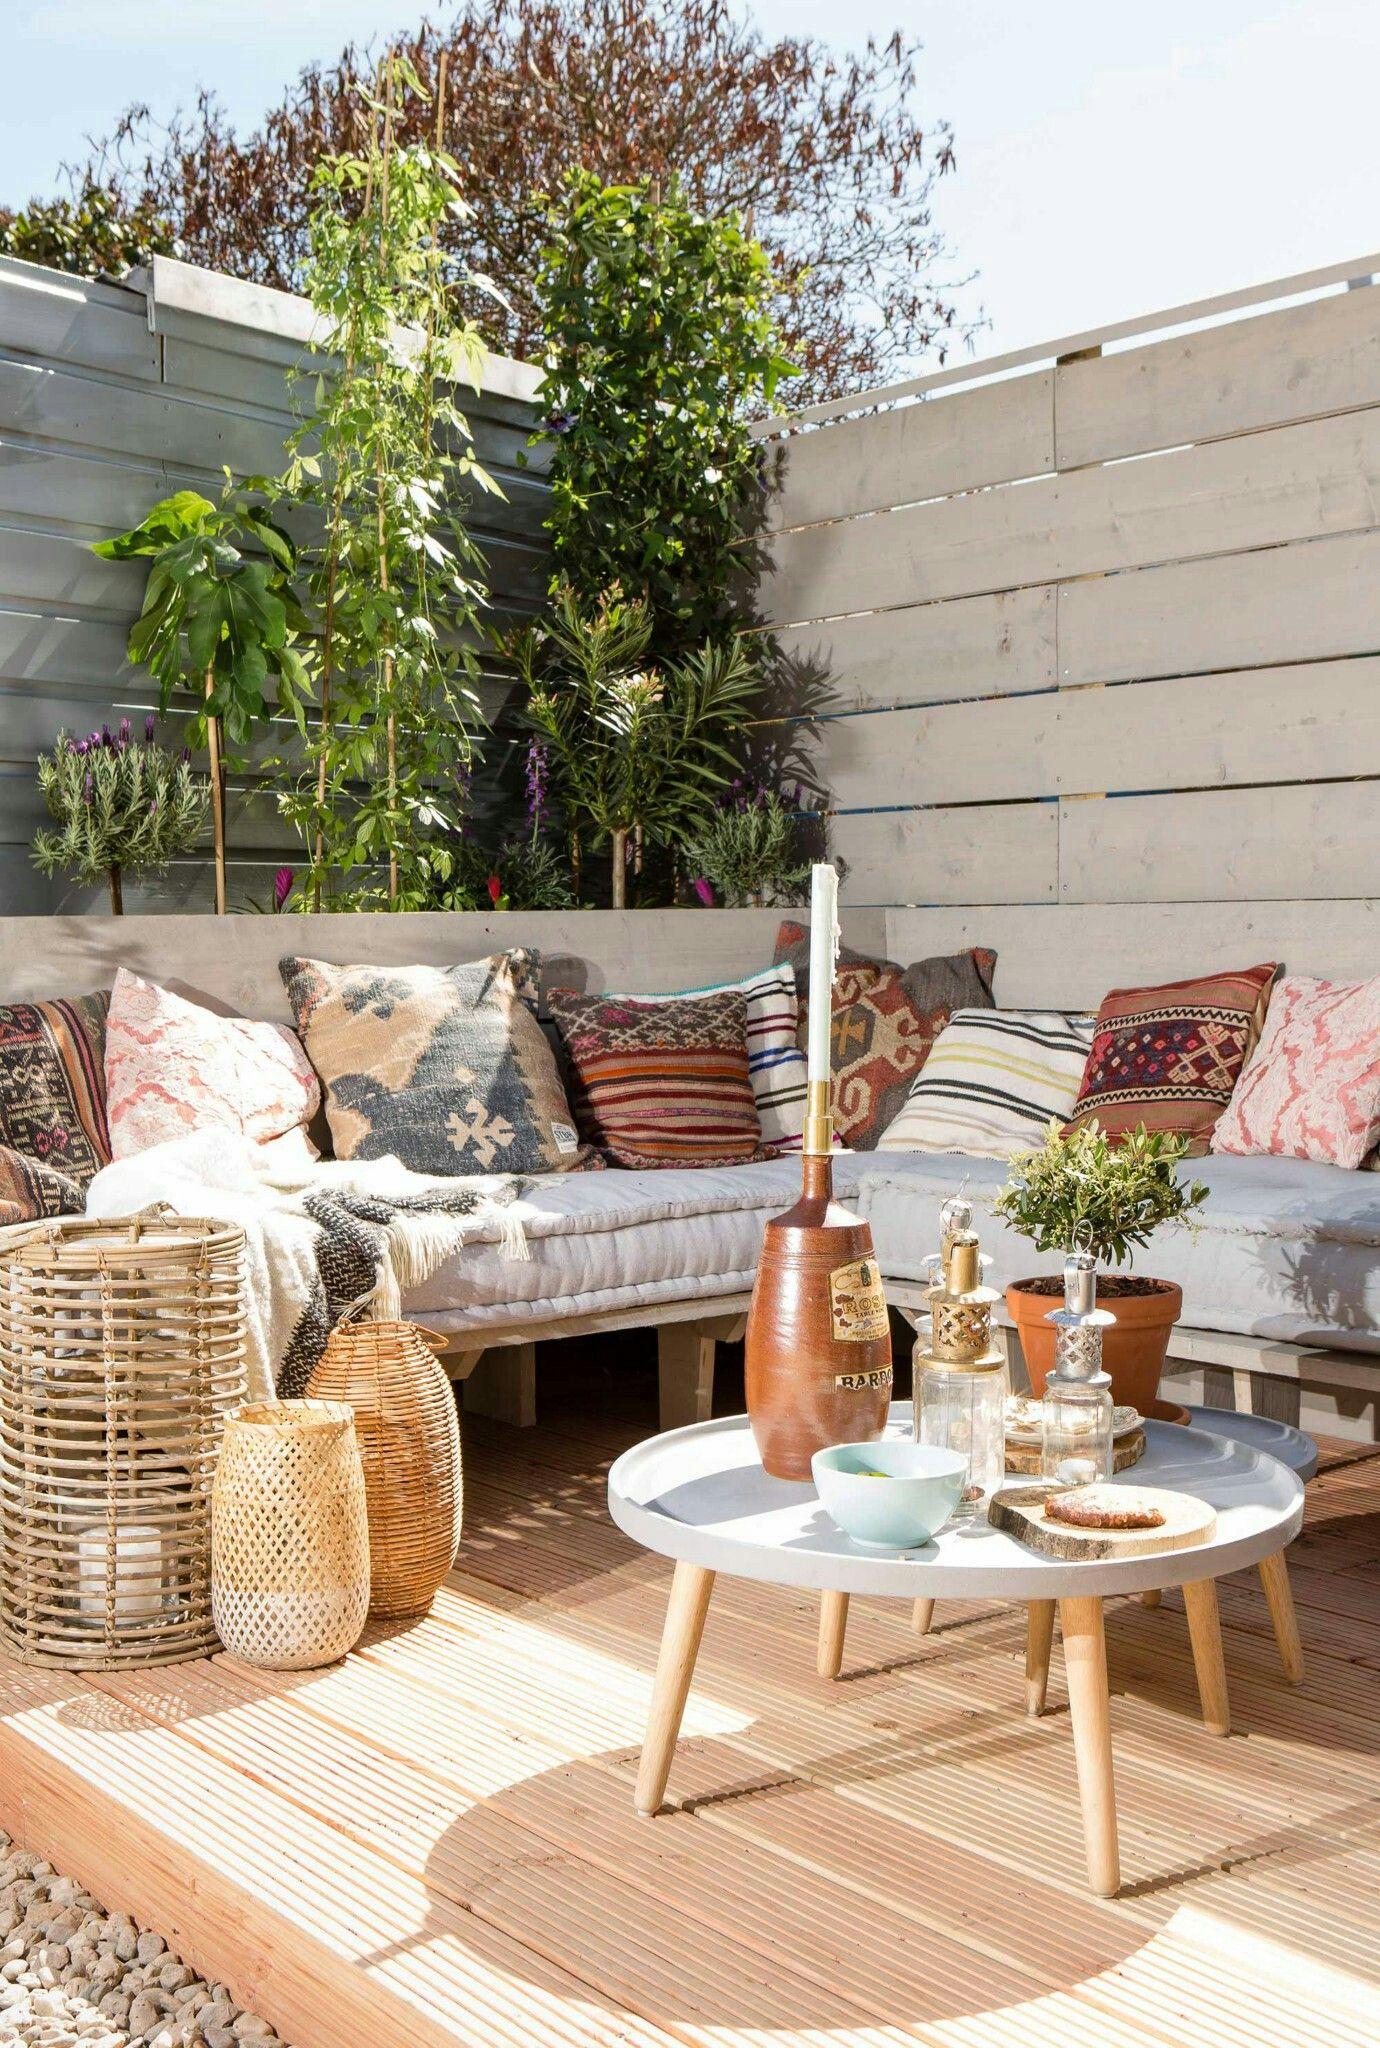 Pin de Toesgirl en OUTDOOR LIVING | Pinterest | Terrazas, Balcones y ...